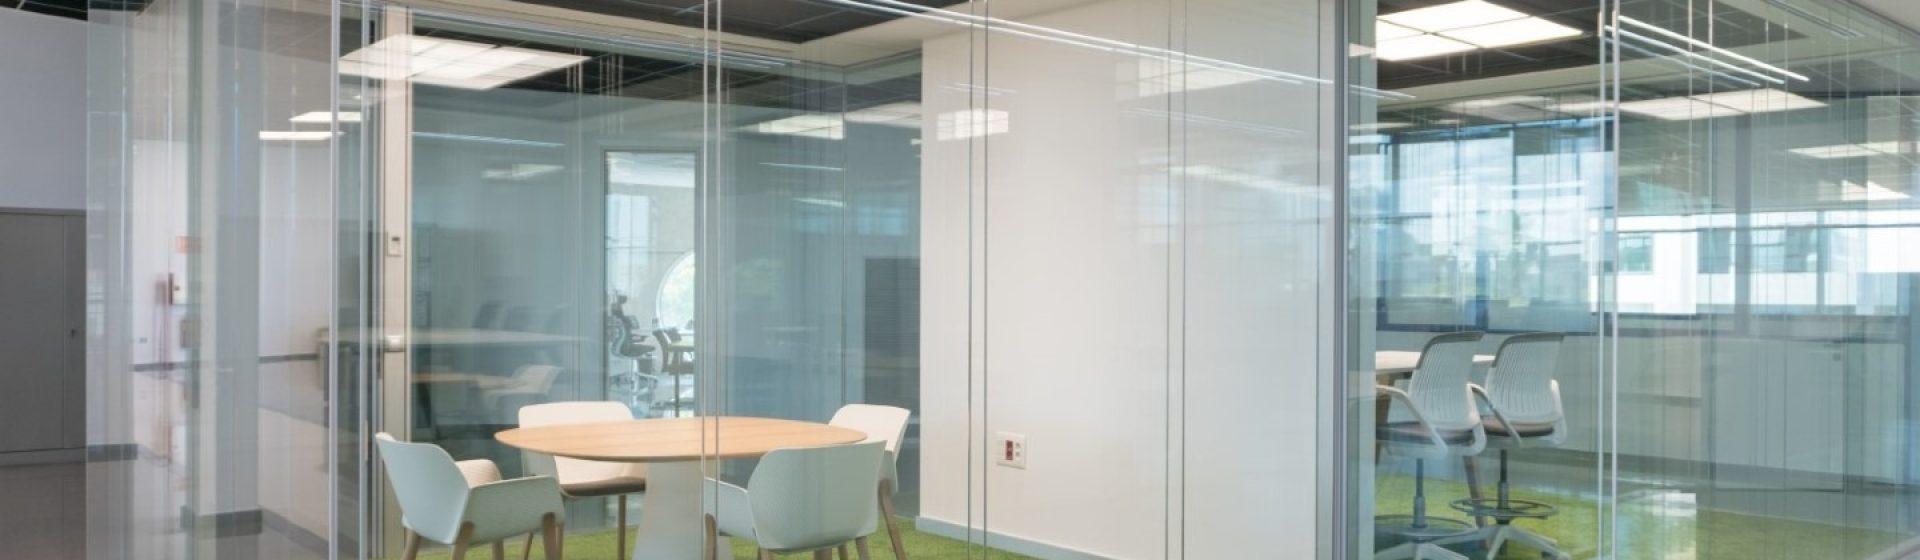 salas-de-reuniones-acristaladas